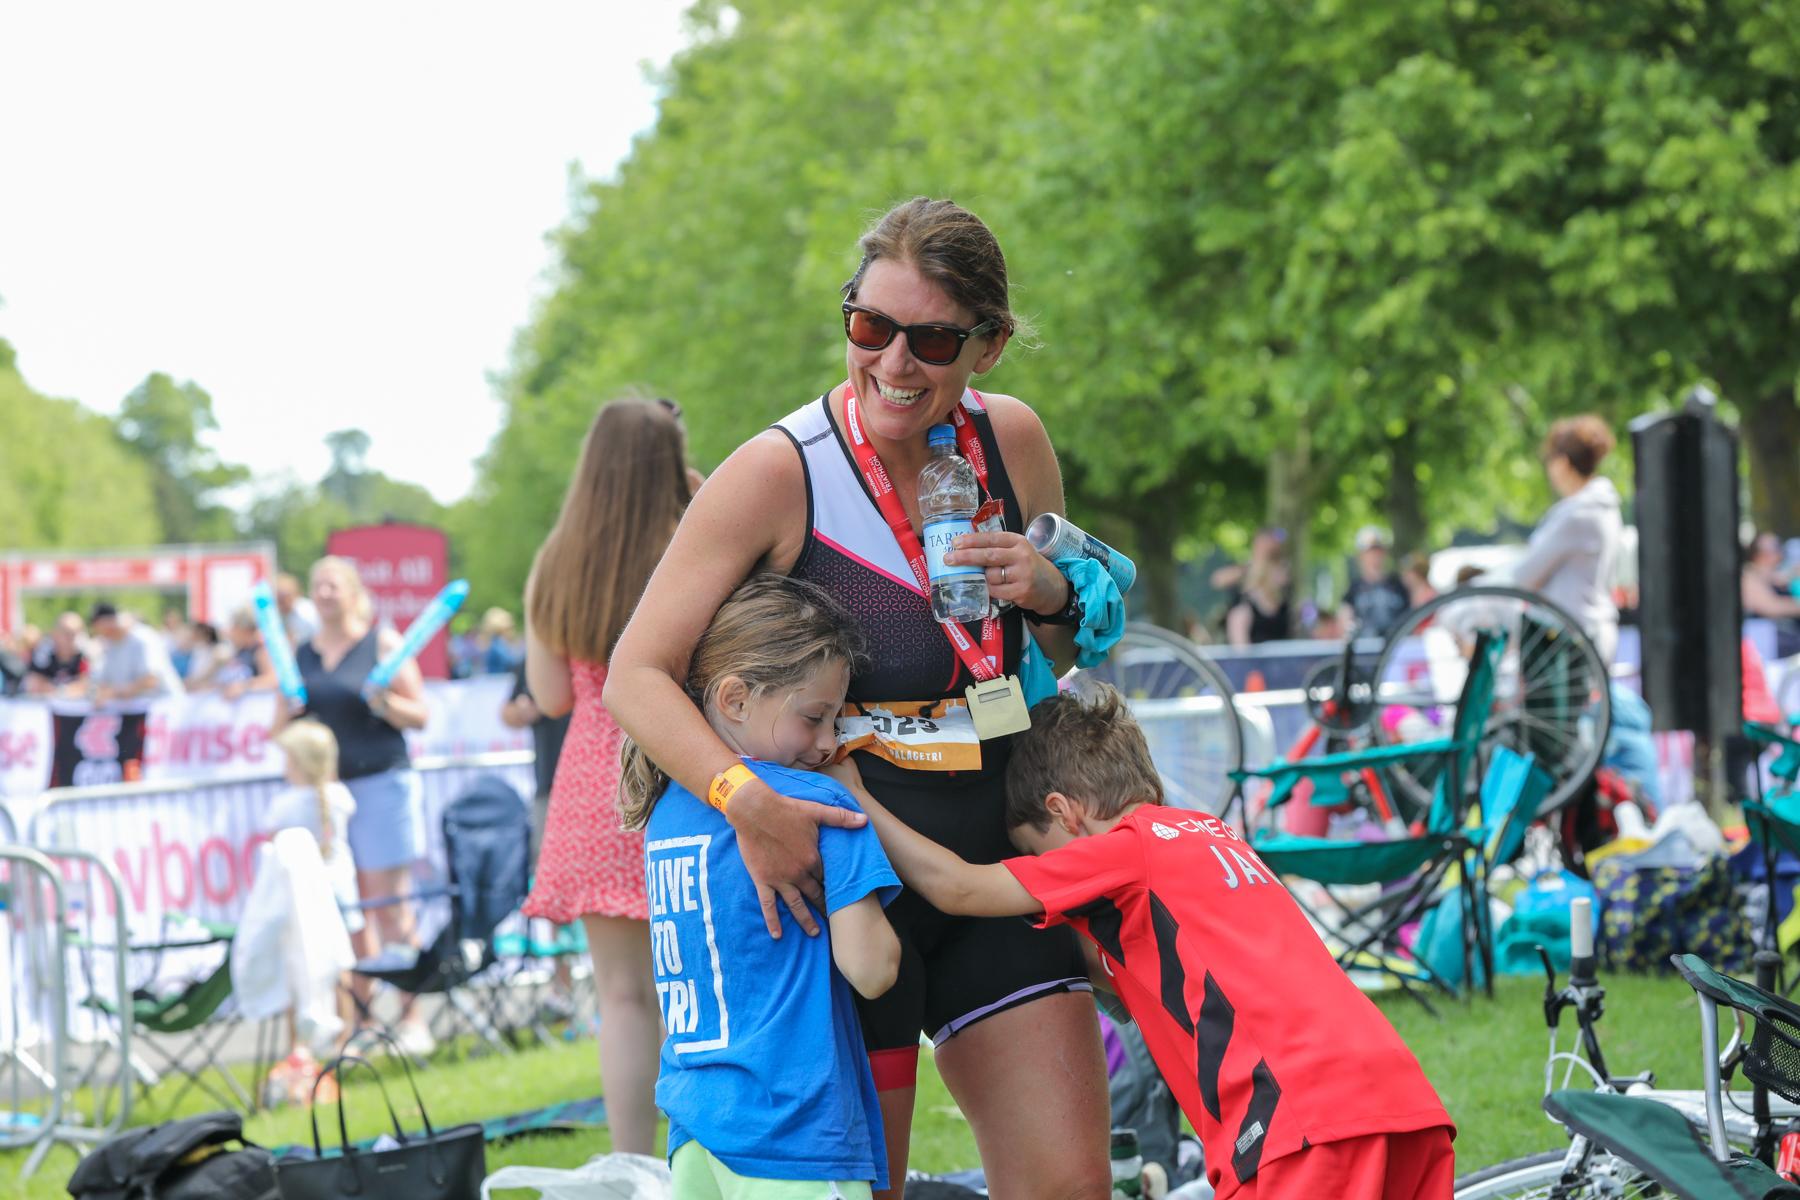 Blenheim Palace Triathlon - image 1